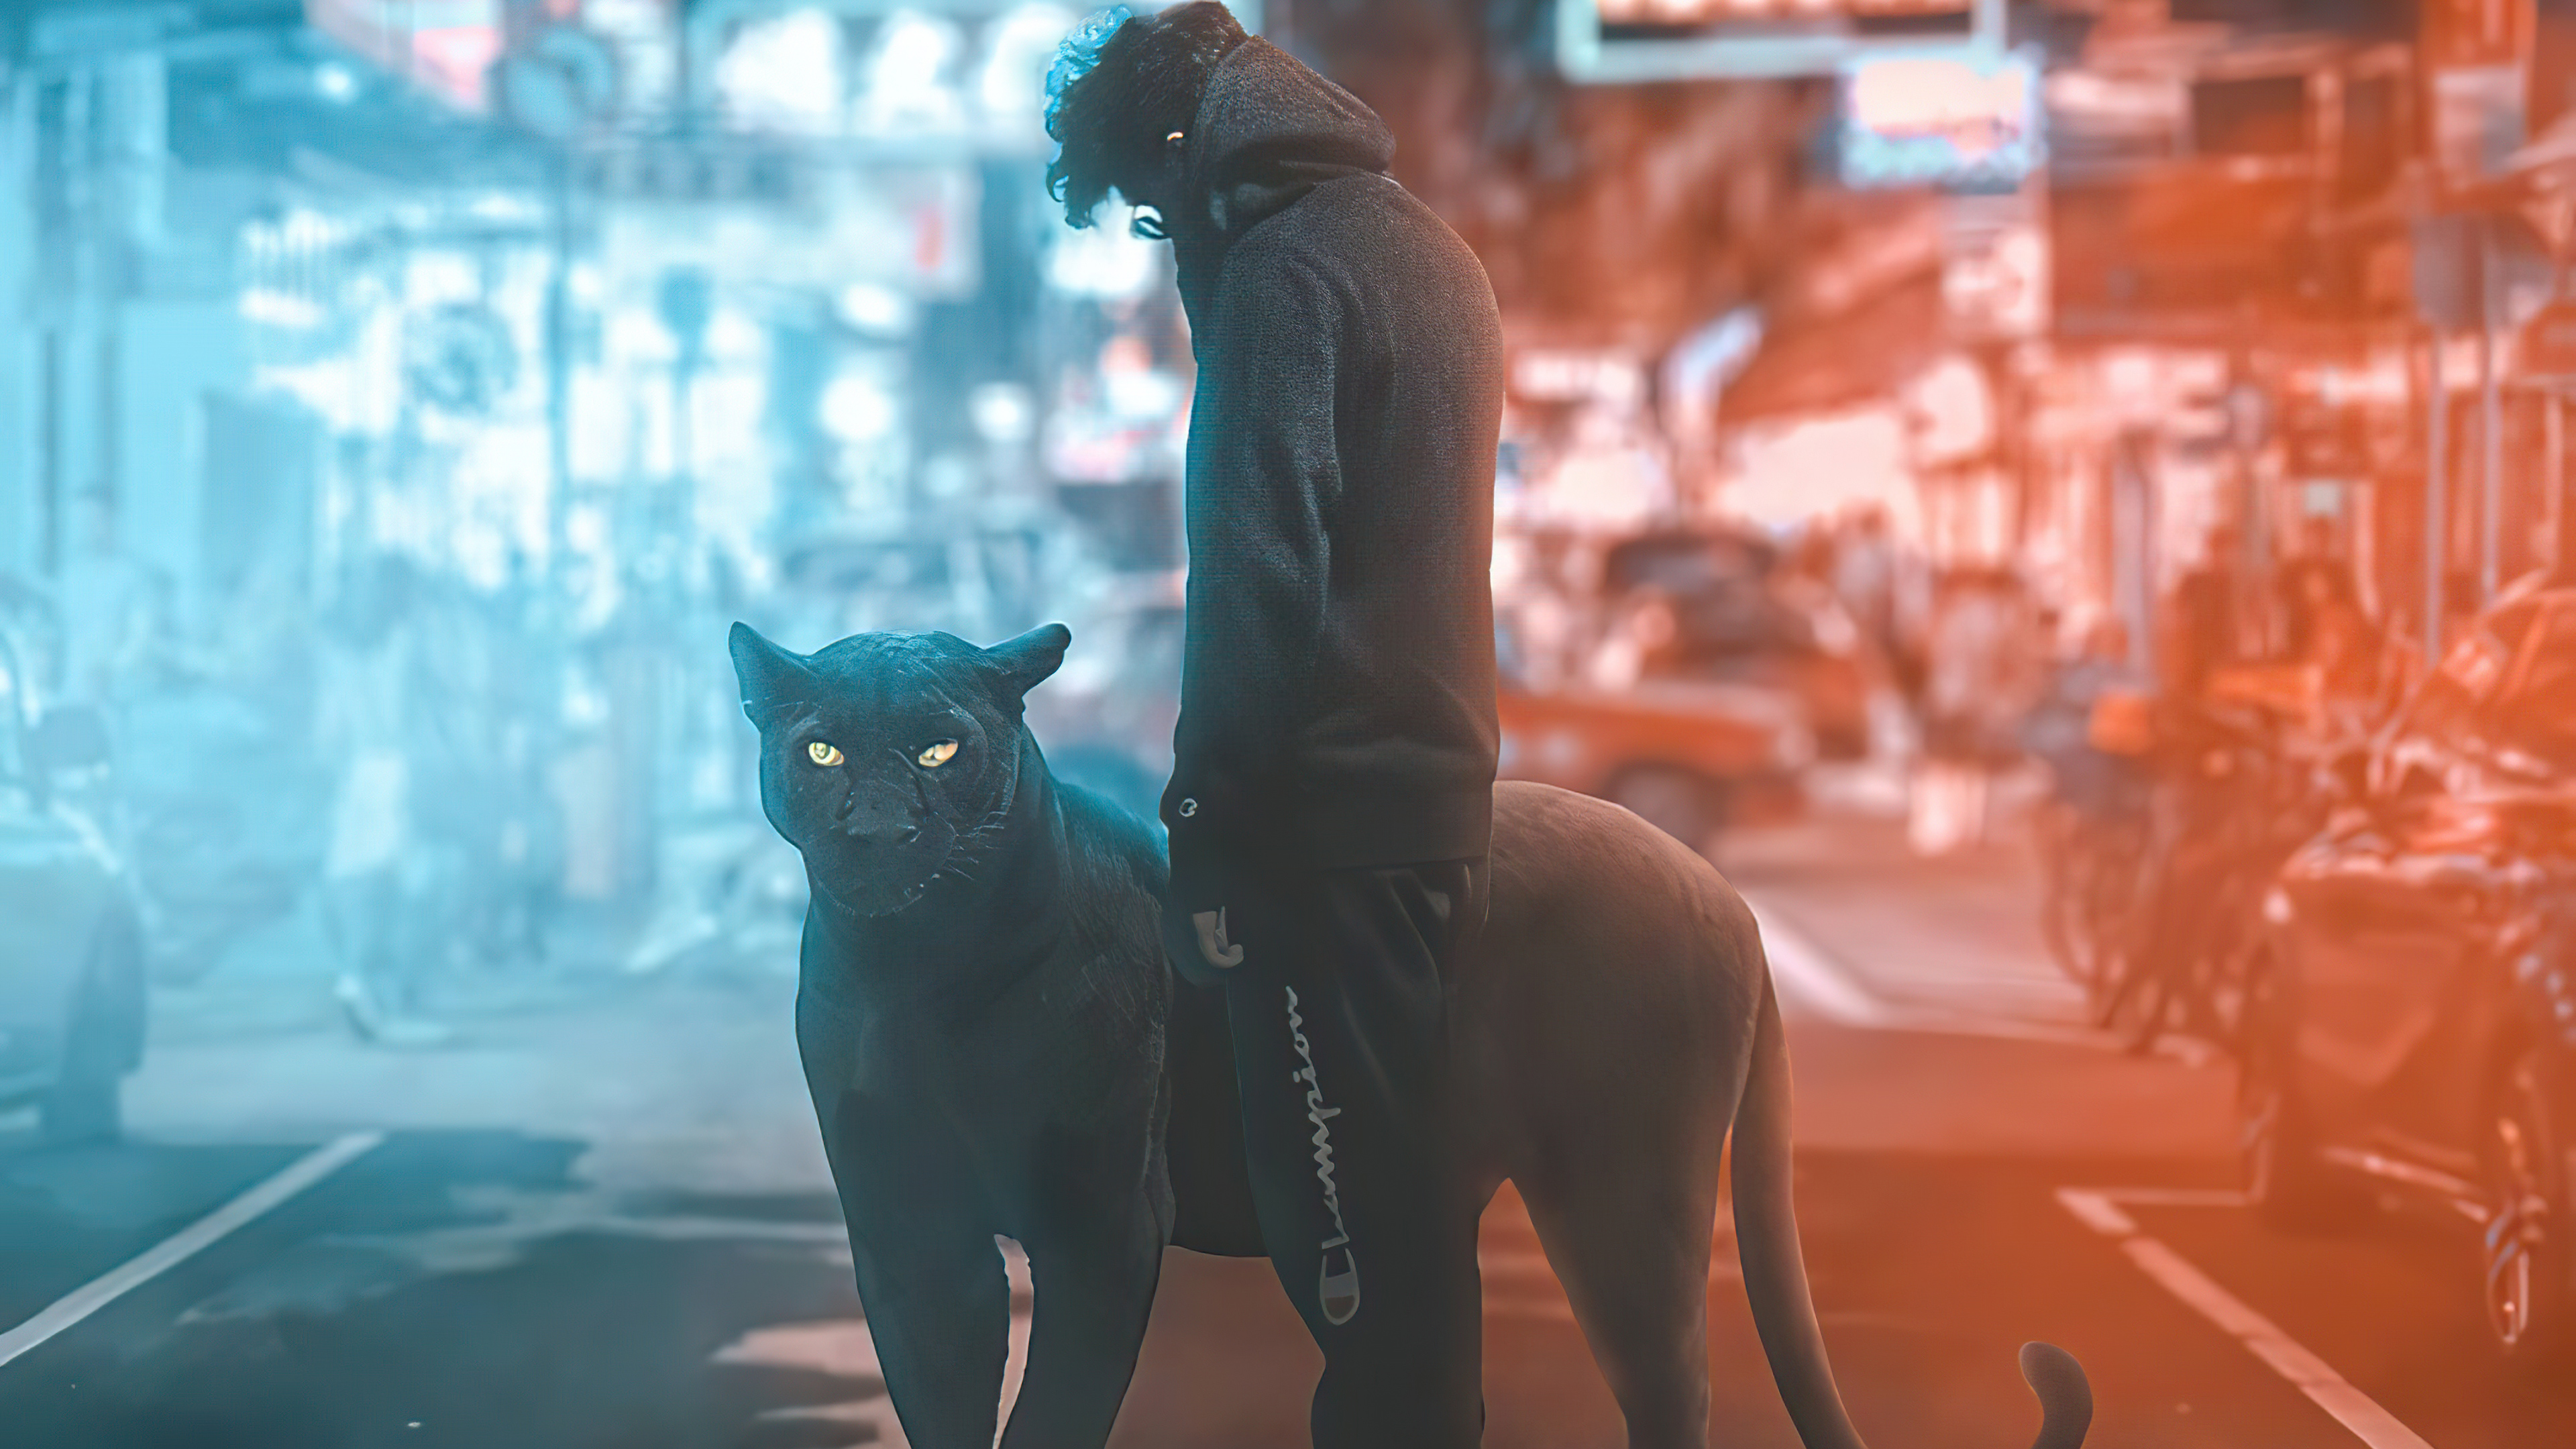 black panther and hoodie boy 4k 1608581273 - Black Panther And Hoodie Boy 4k - Black Panther And Hoodie Boy 4k wallpapers